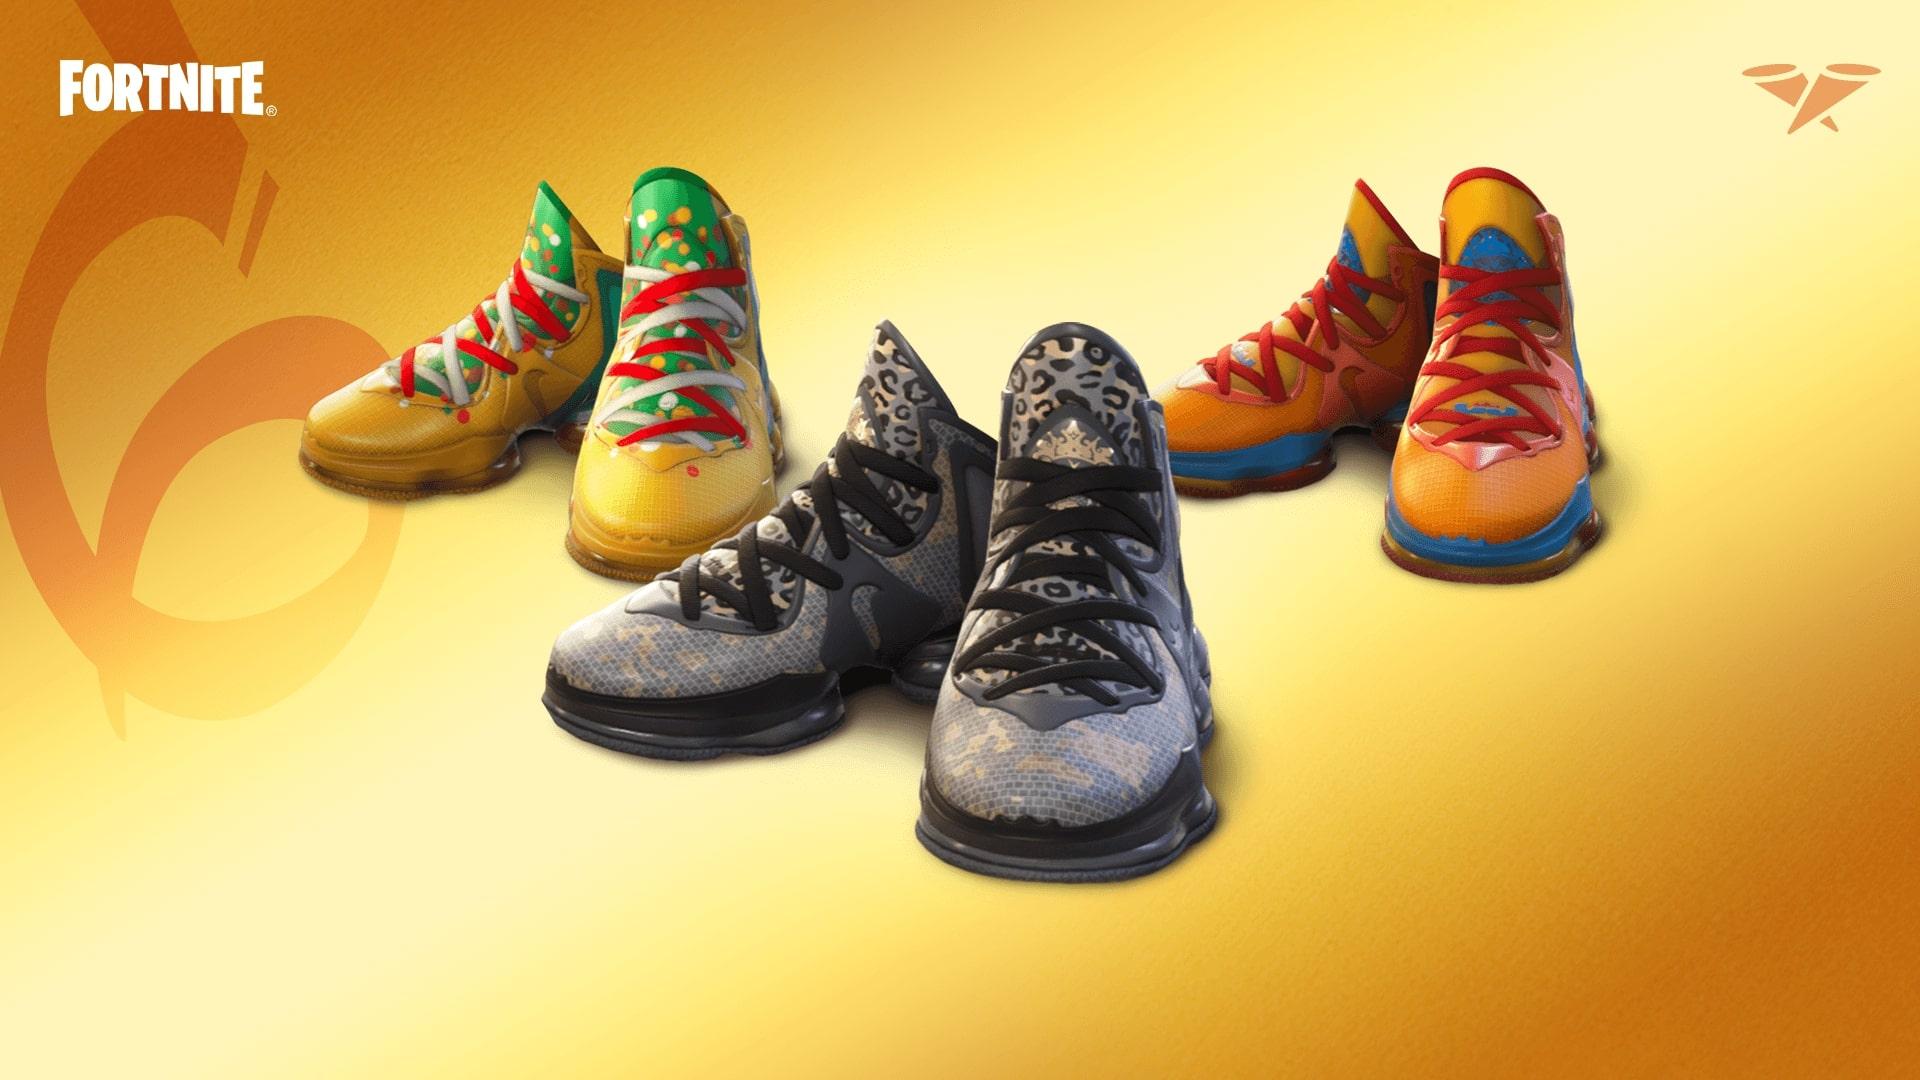 Fortnite LeBron James shoes